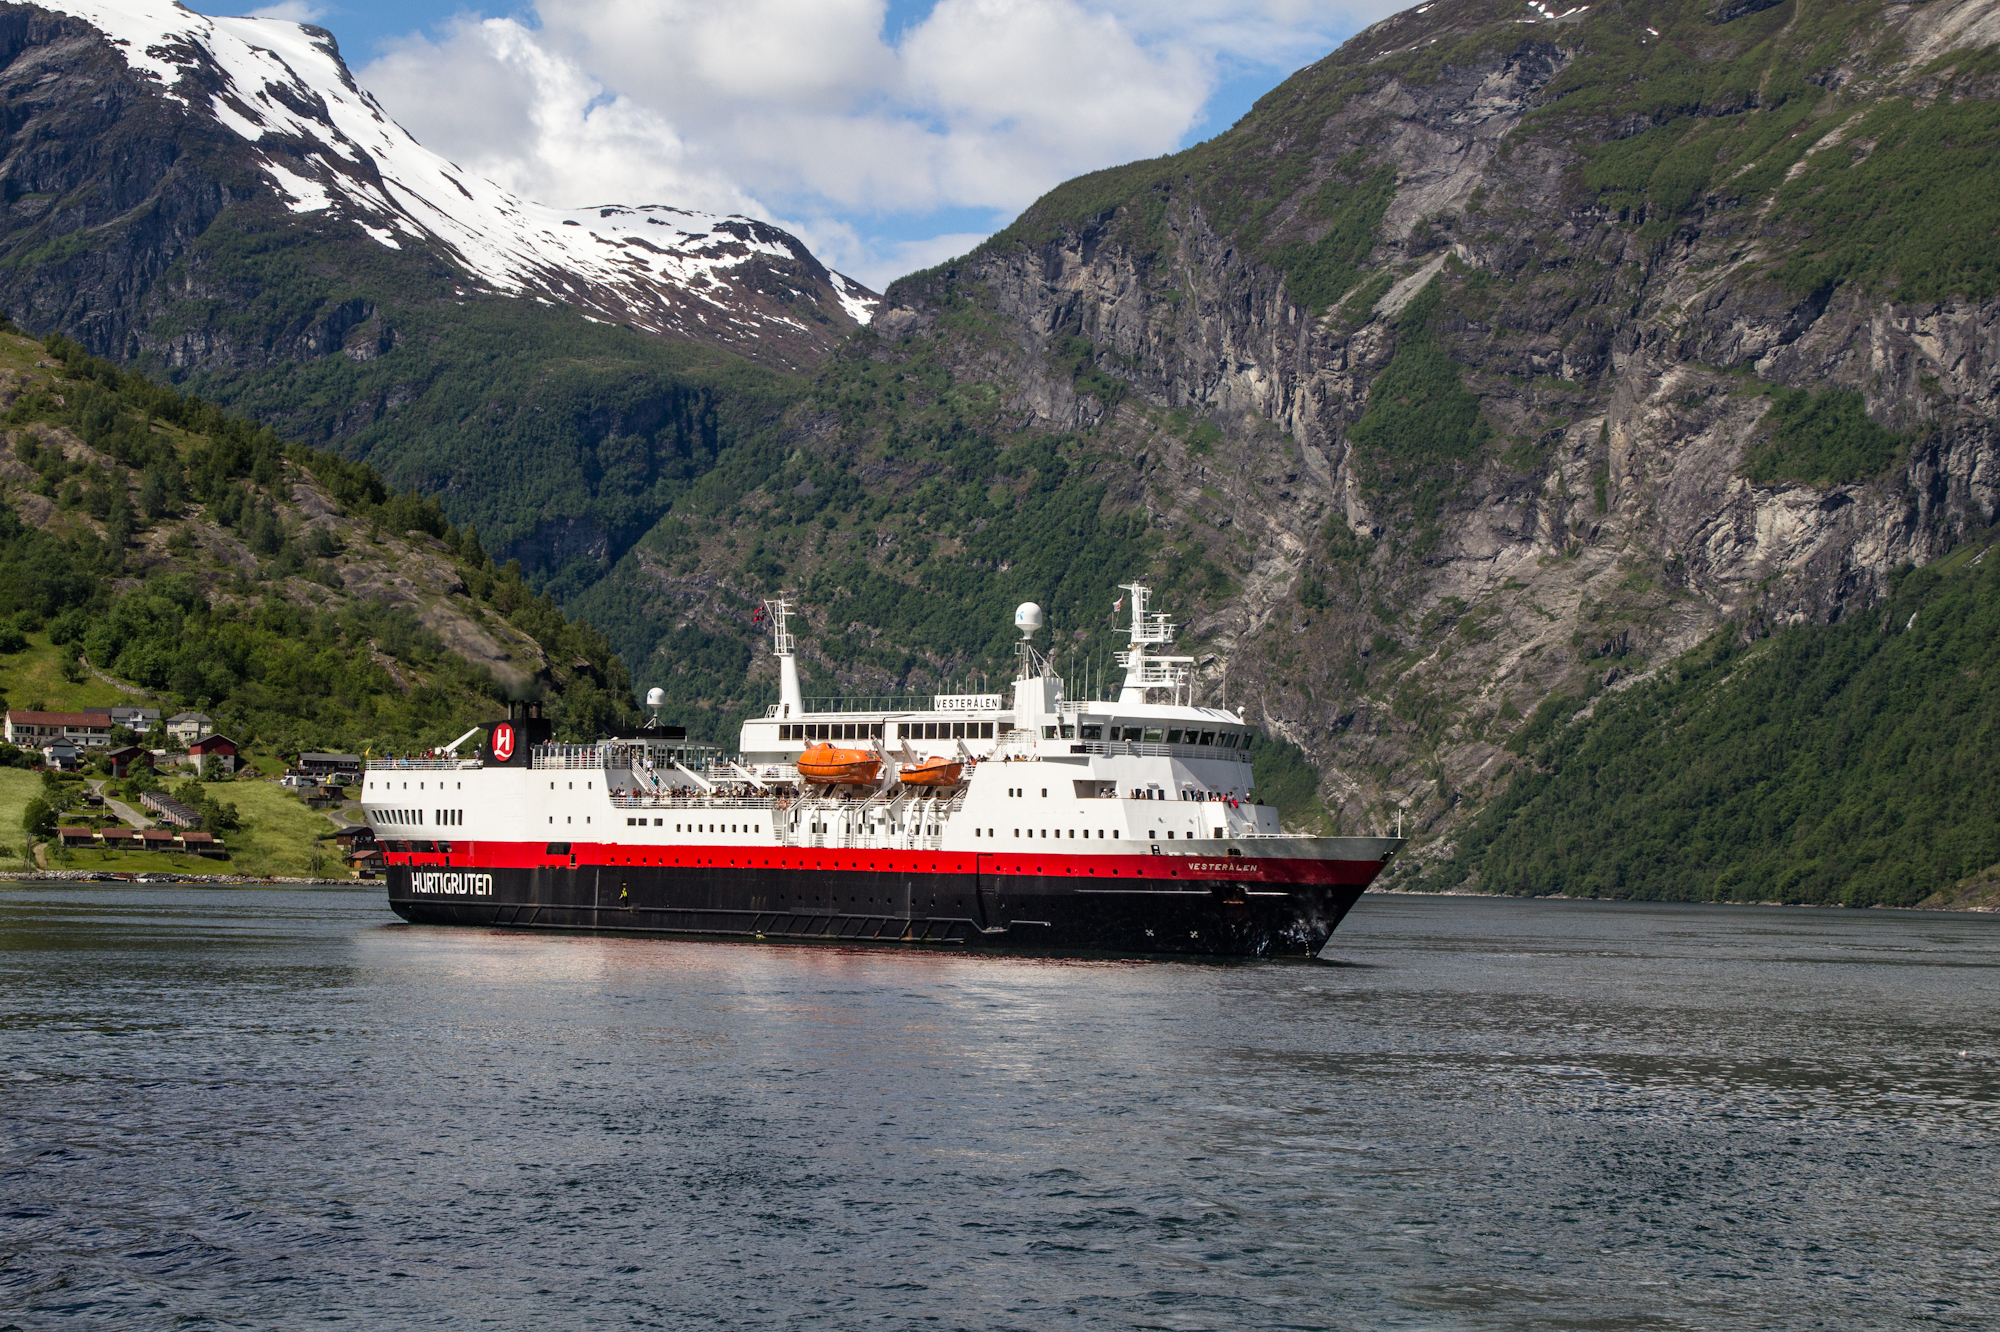 Hurtigruten - MS Vesteralen in the Norwegian Fjords